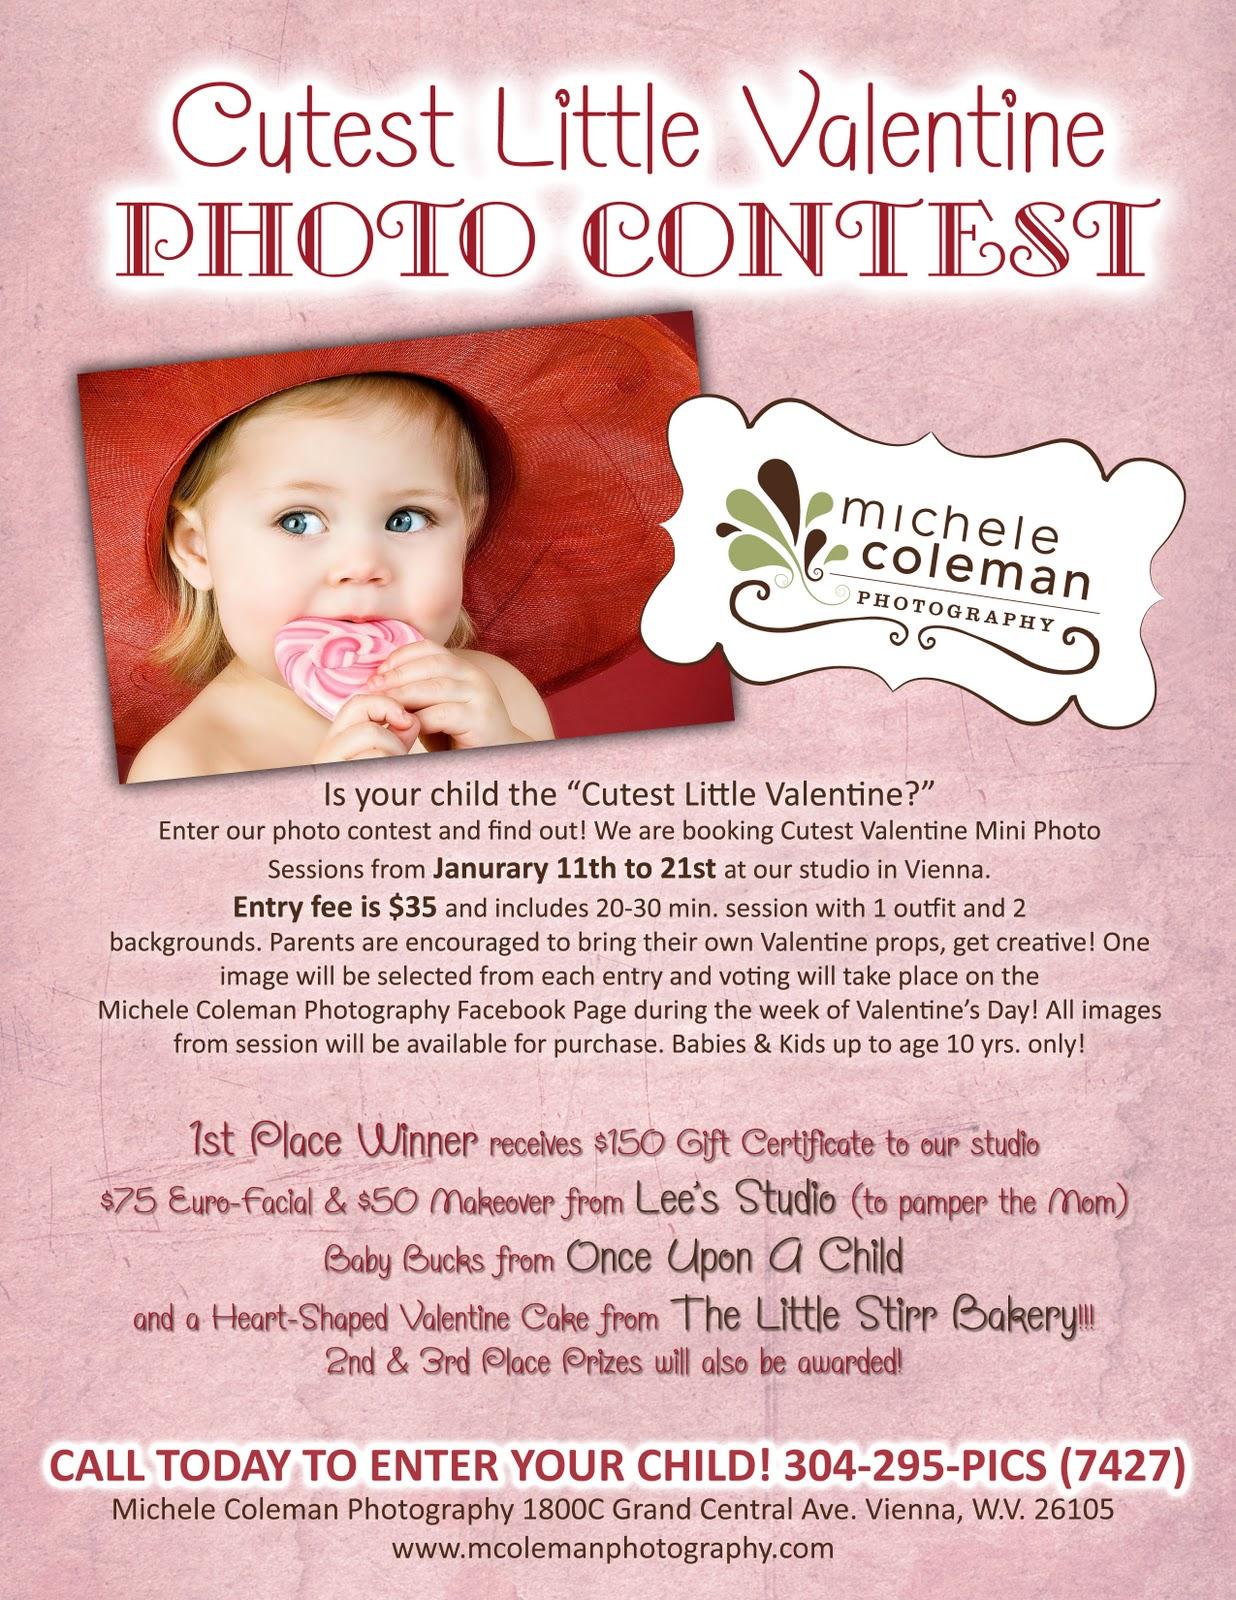 Cutest Little Valentine Photo Contest! | Michele Coleman ...